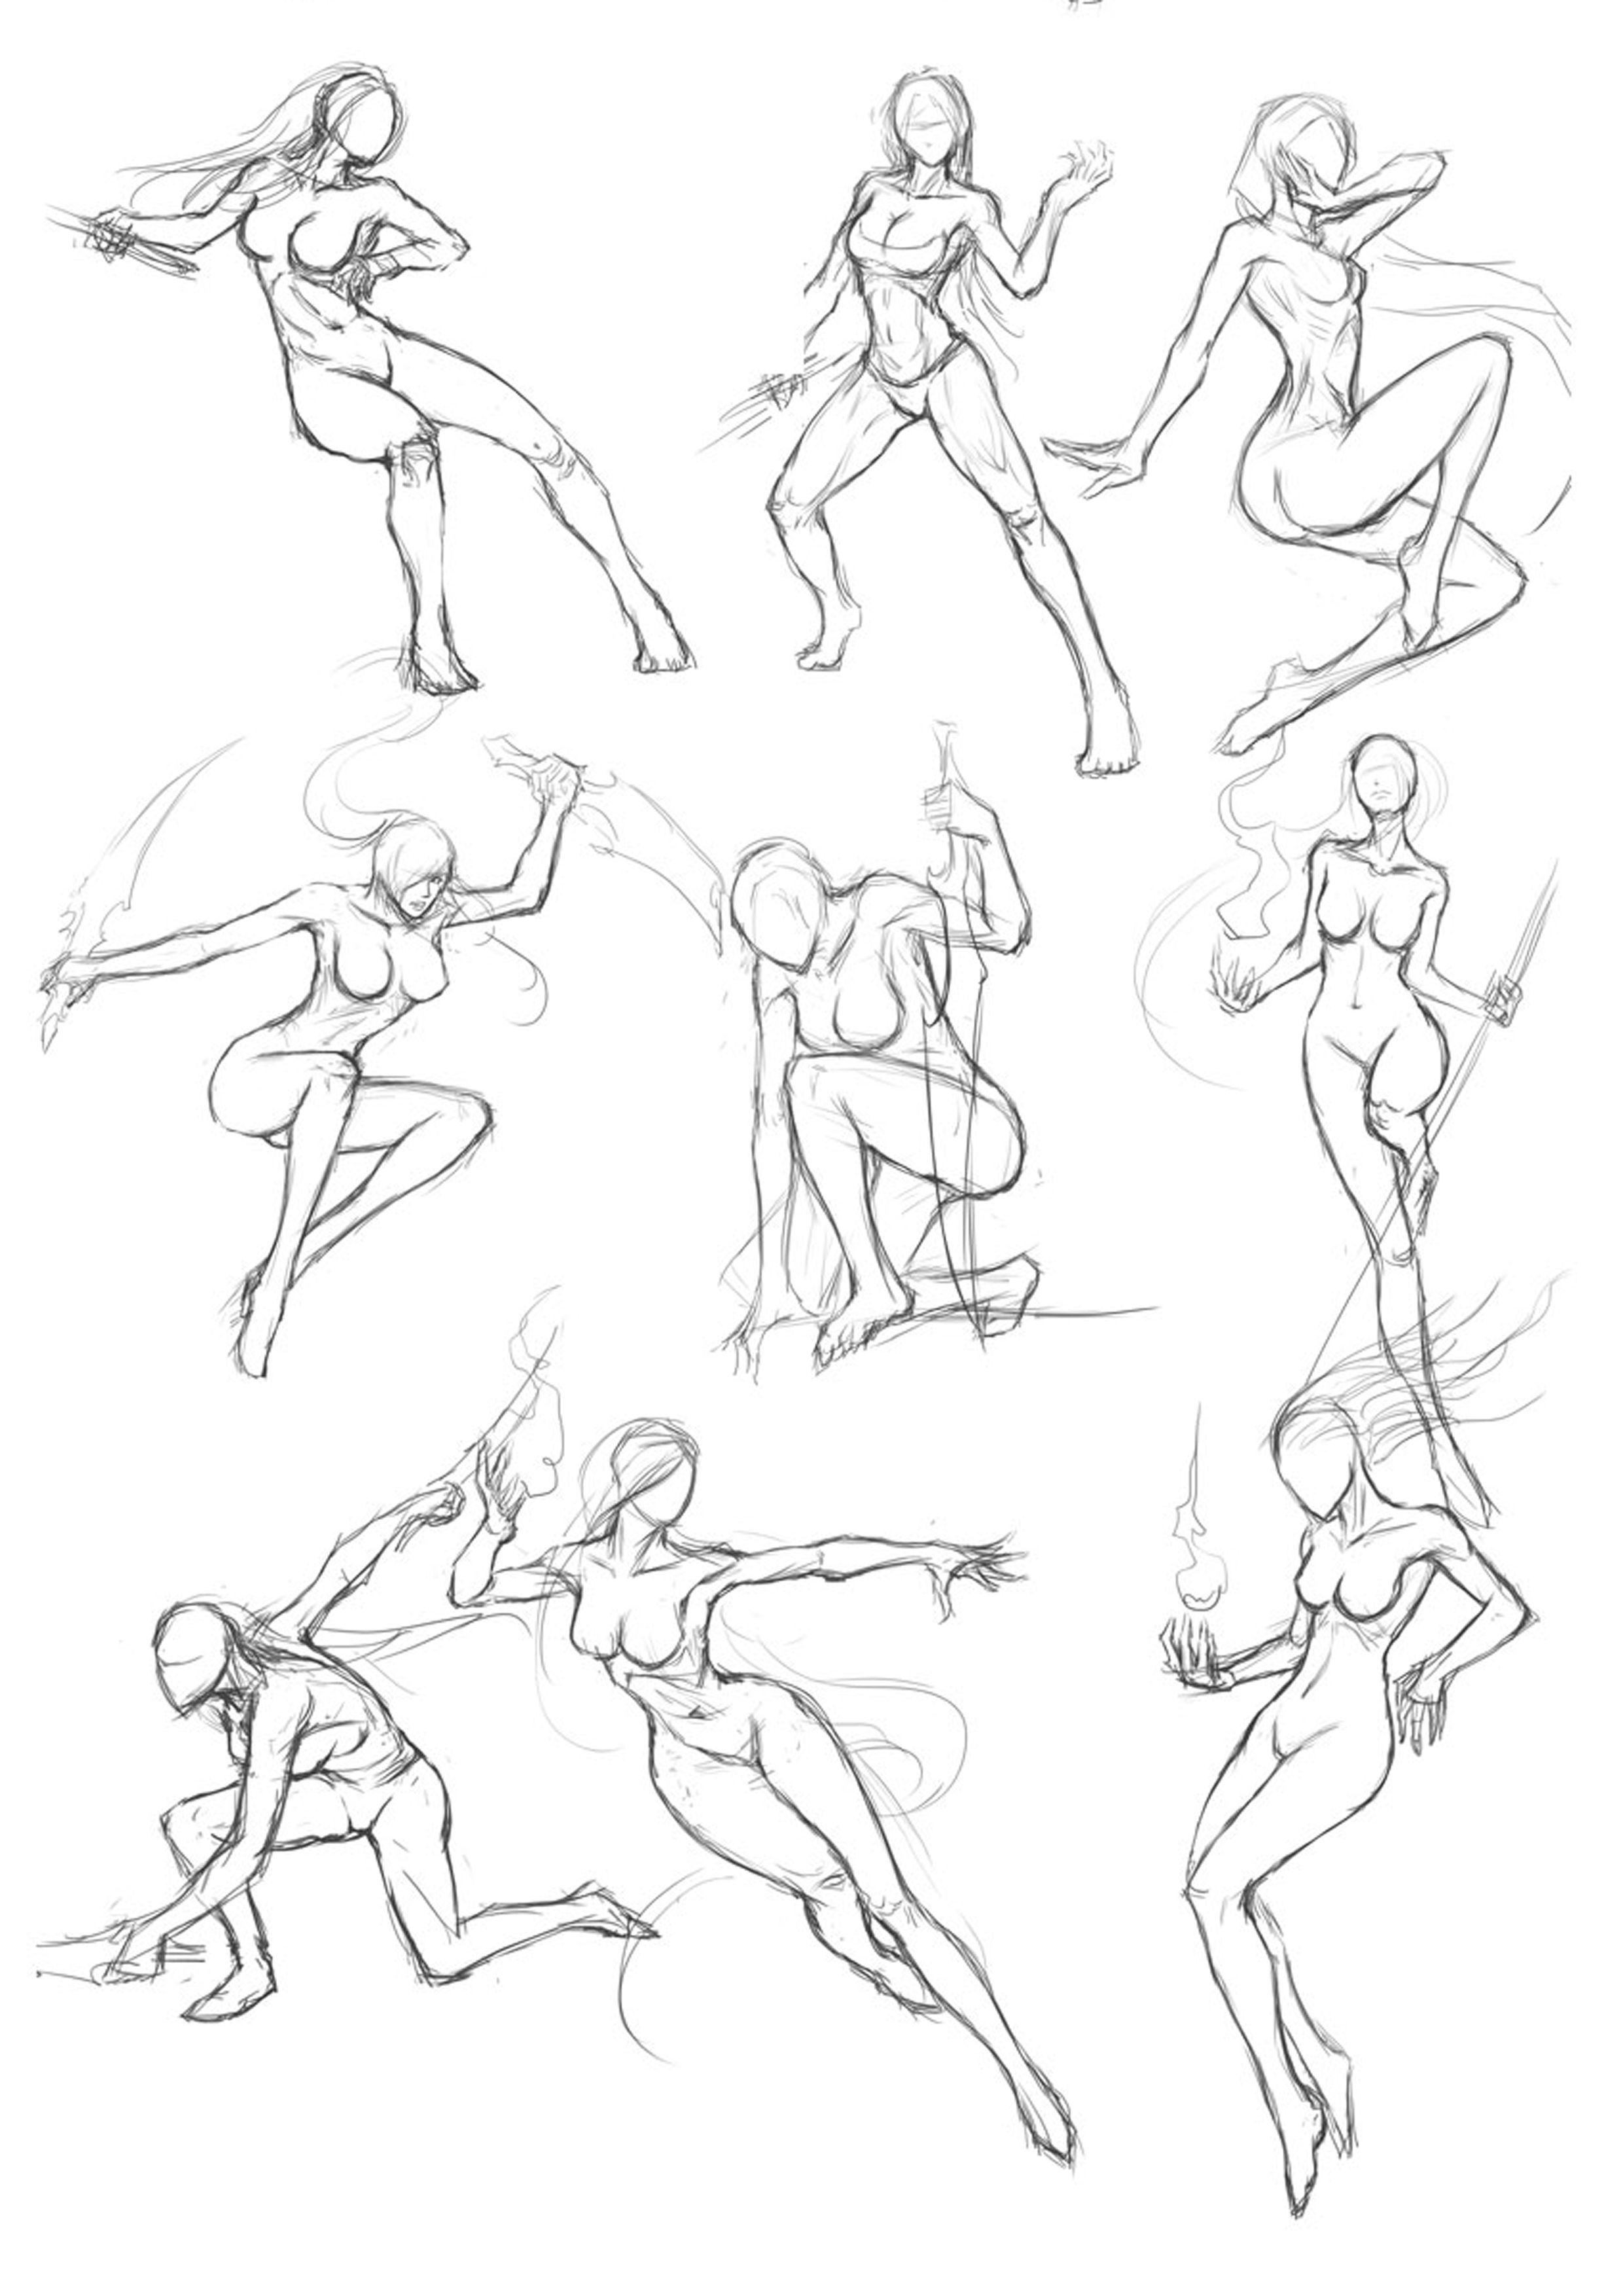 2480x3508 Martial Arts Posture Ref Martial, Drawings